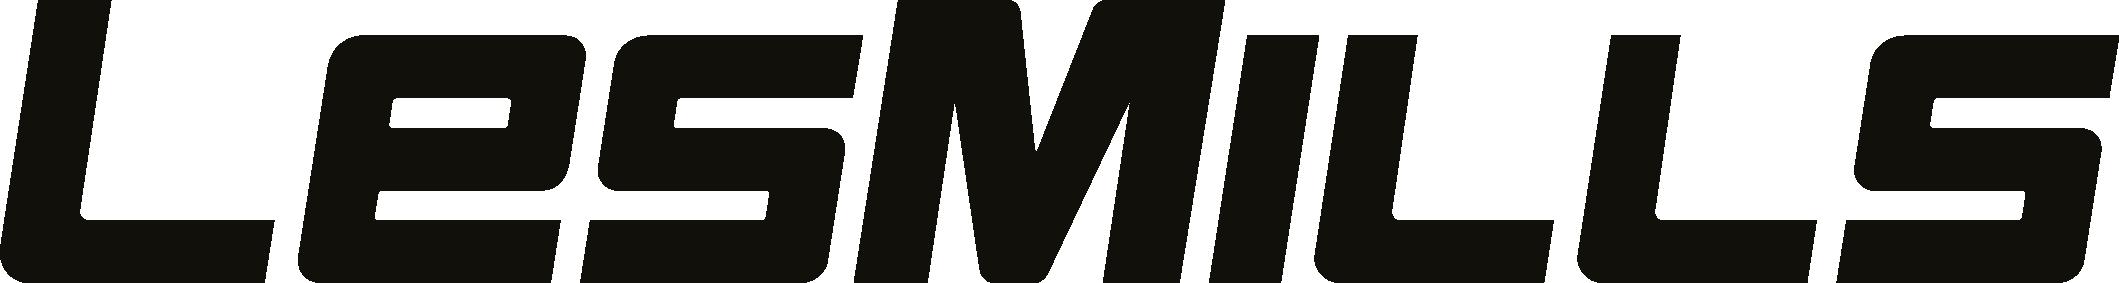 Les-Mills-main-logo-Black